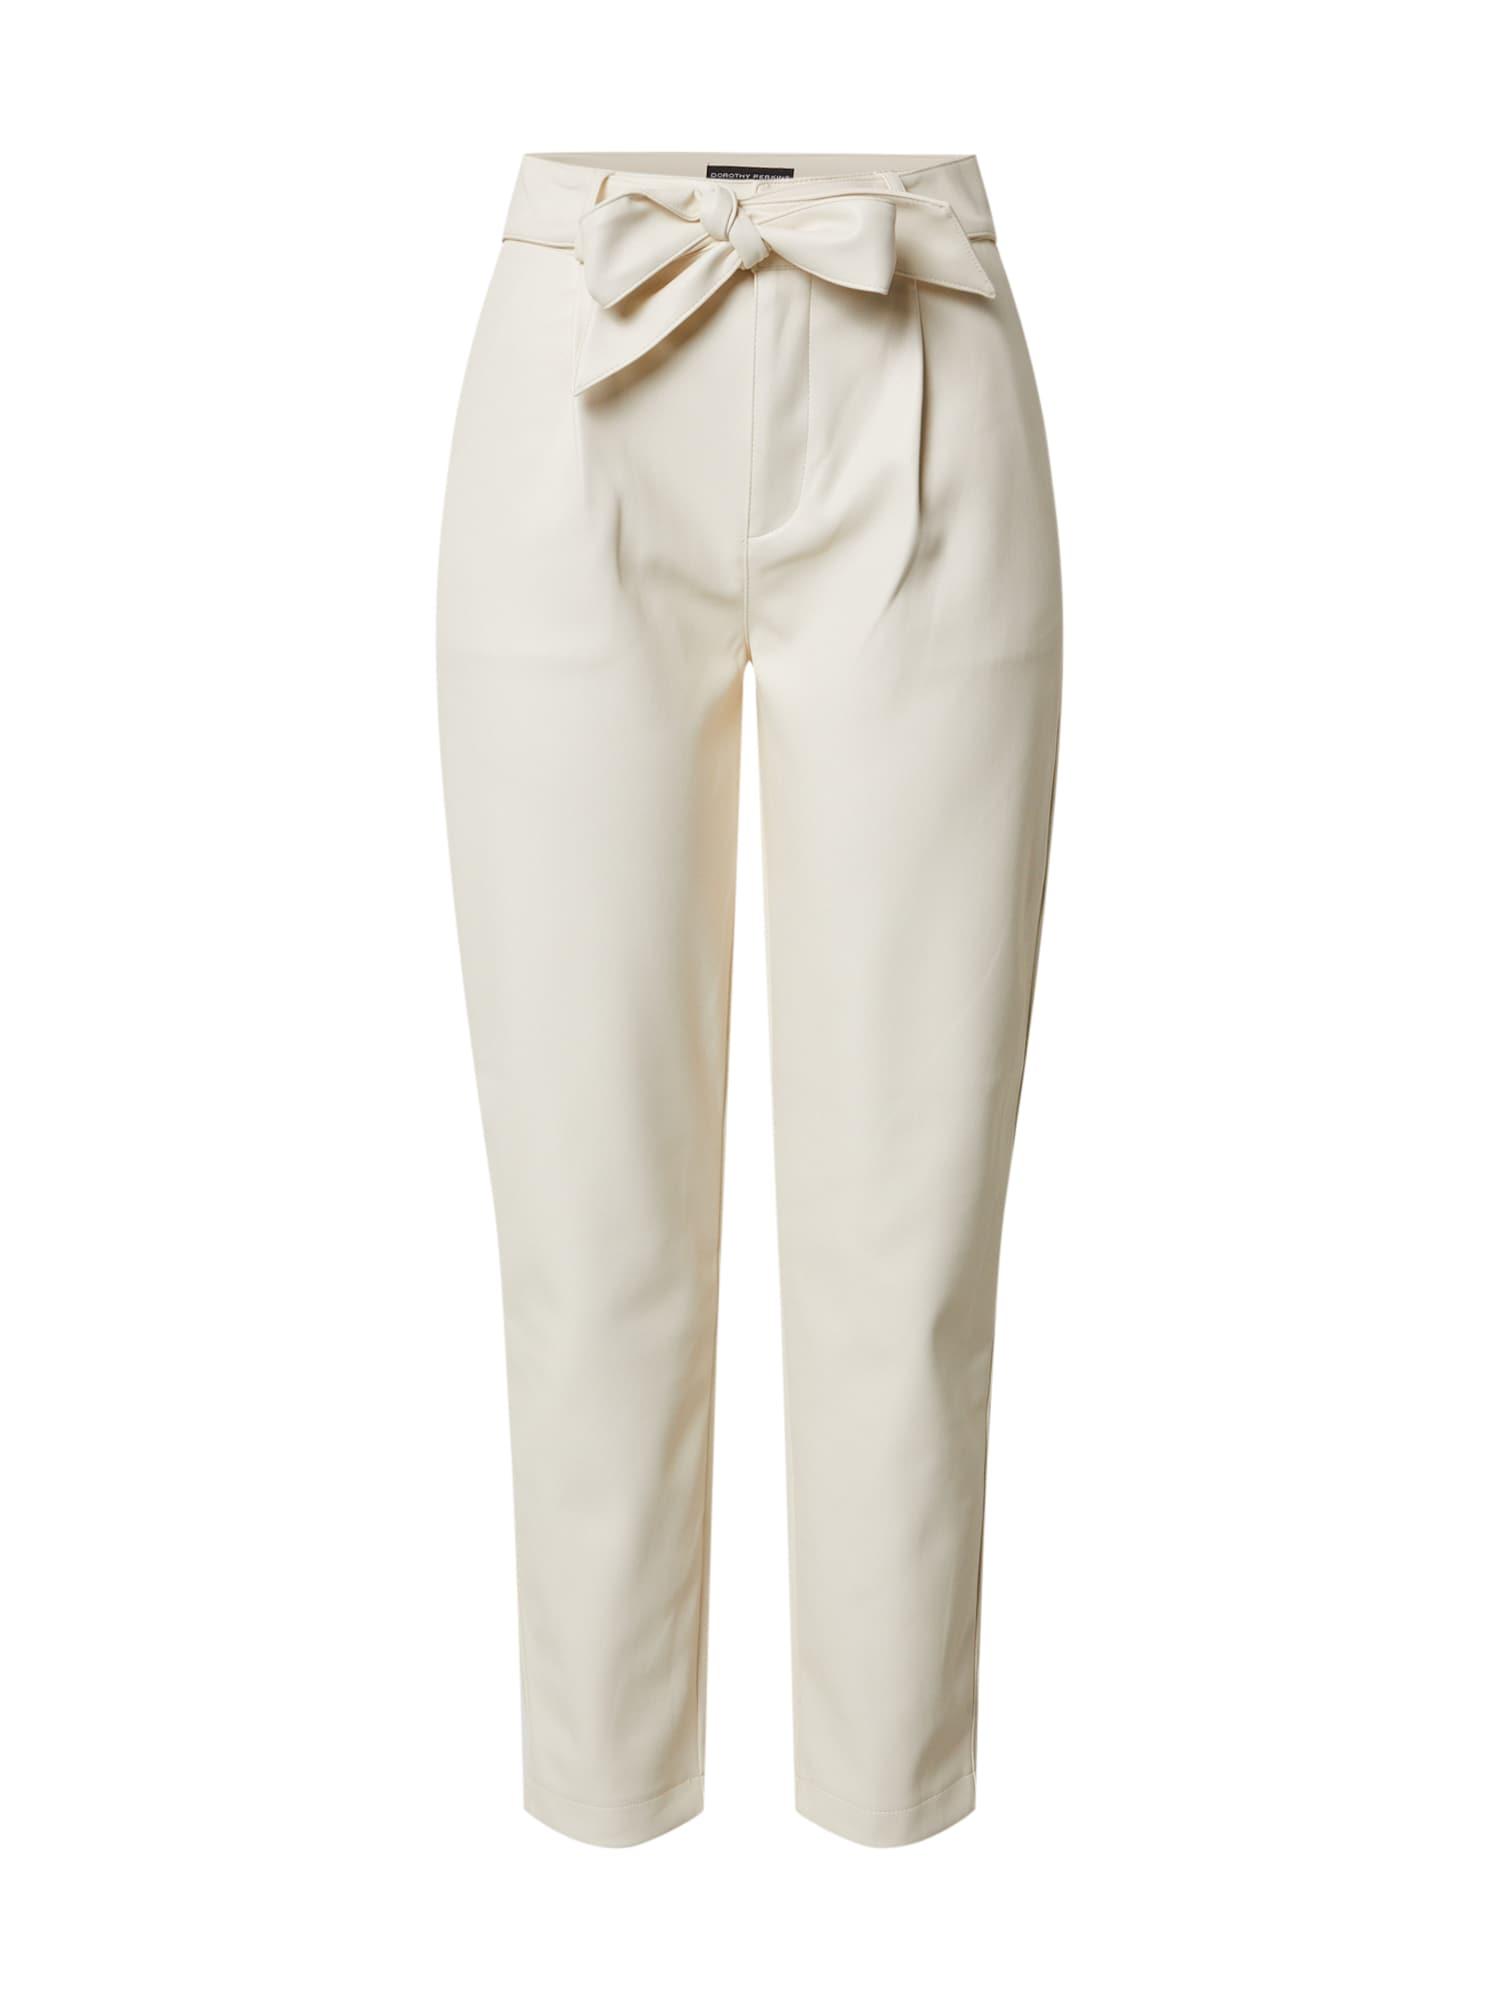 Dorothy Perkins Klostuotos kelnės 'Cream PU Belted Trouser' kremo